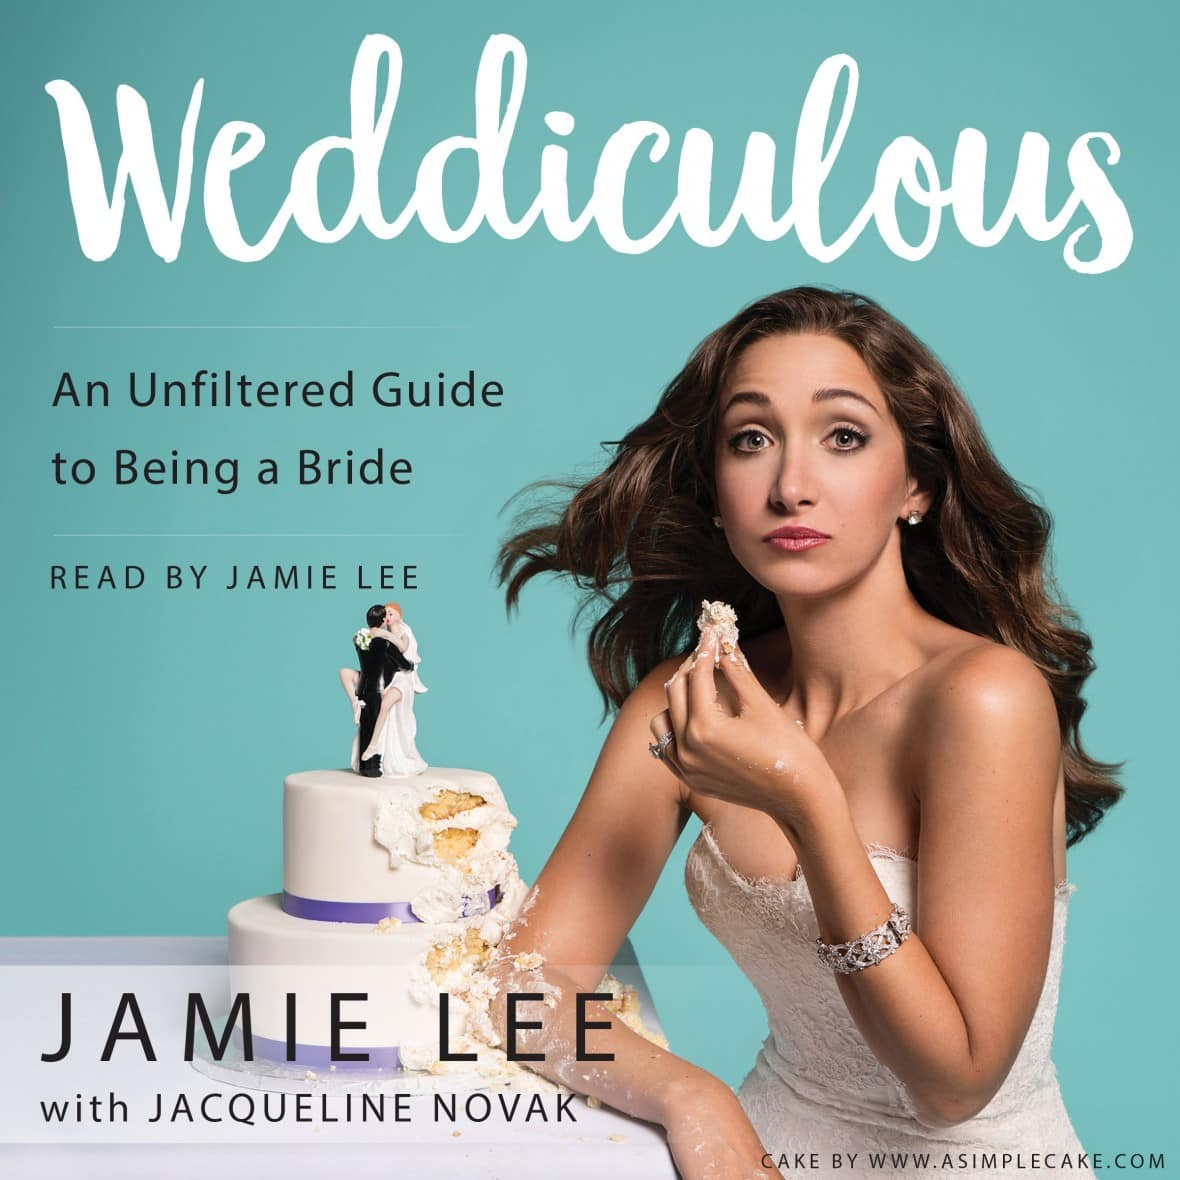 Today only get a free wedding audiobook of Weddiculous by Jamie Lee via Audiobooks.com app! Download the app and your free wedding audiobook today!